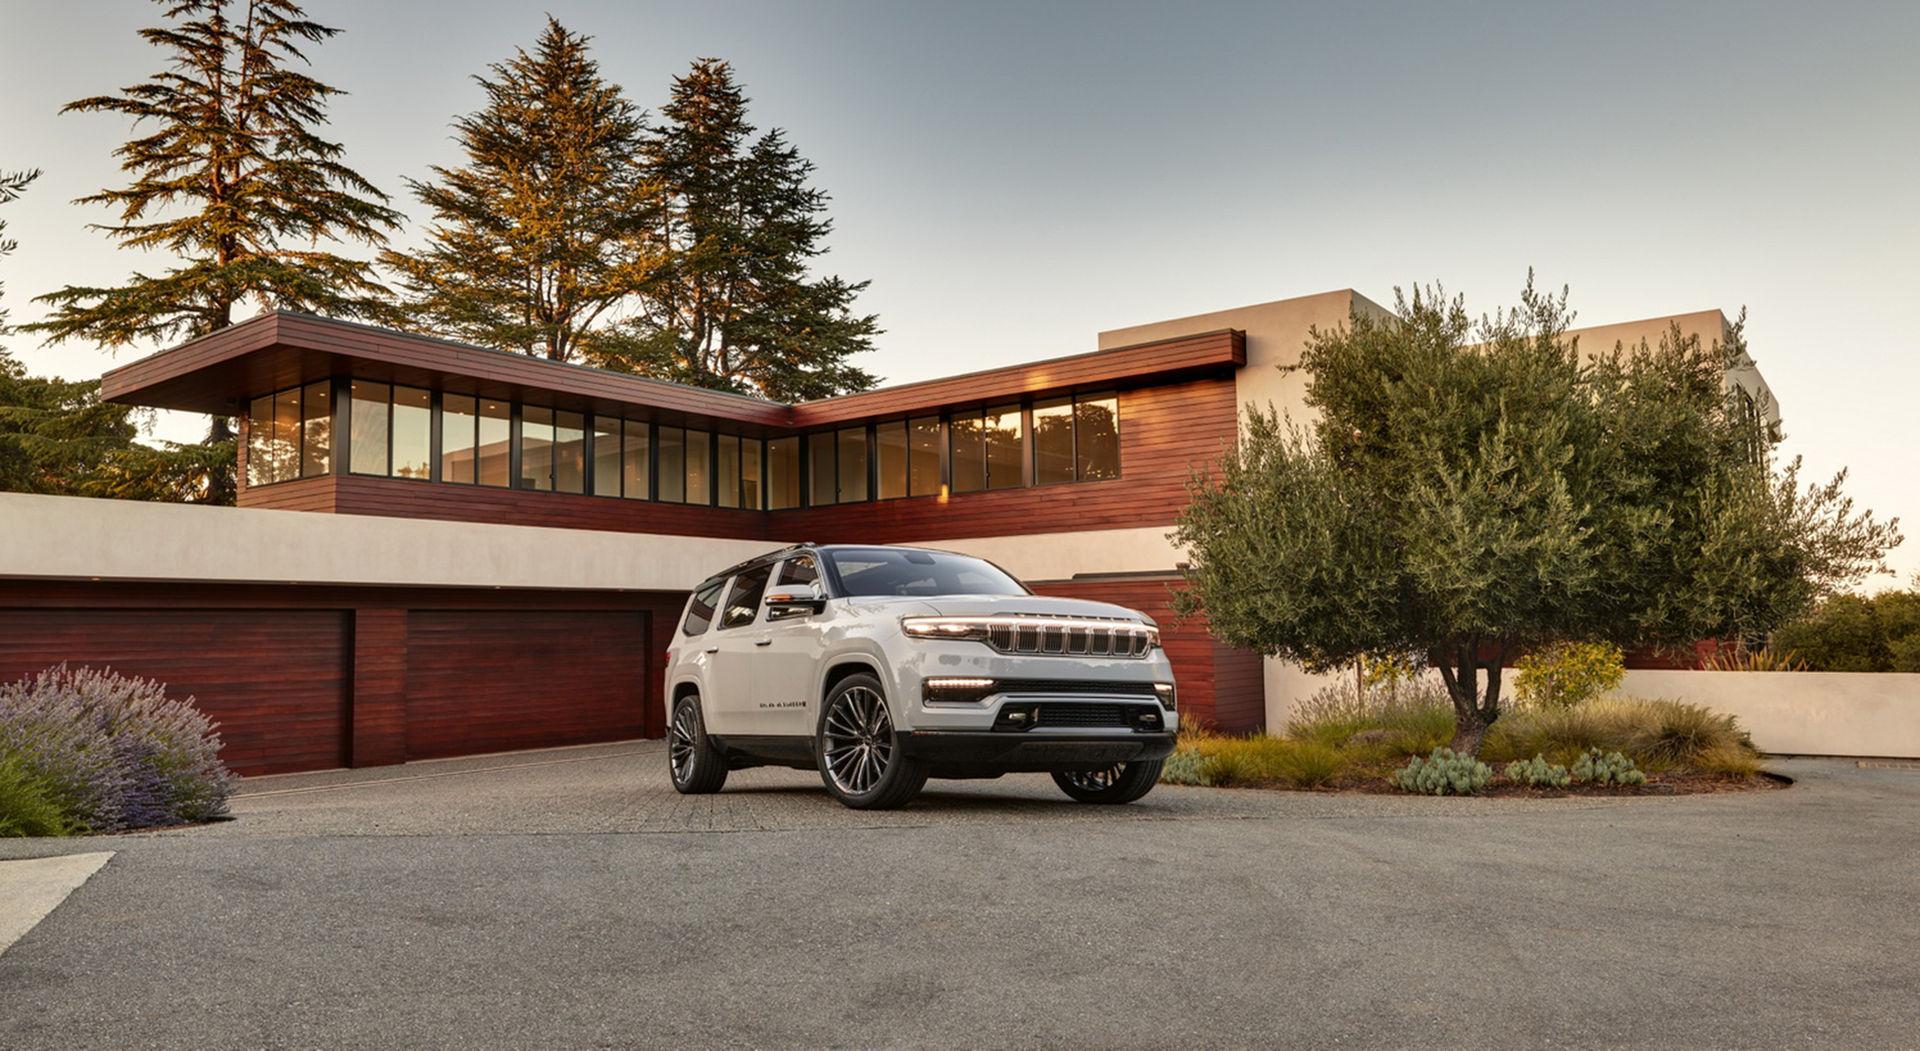 Jeep presenterar Grand Wagoneer och Wrangler 4xe